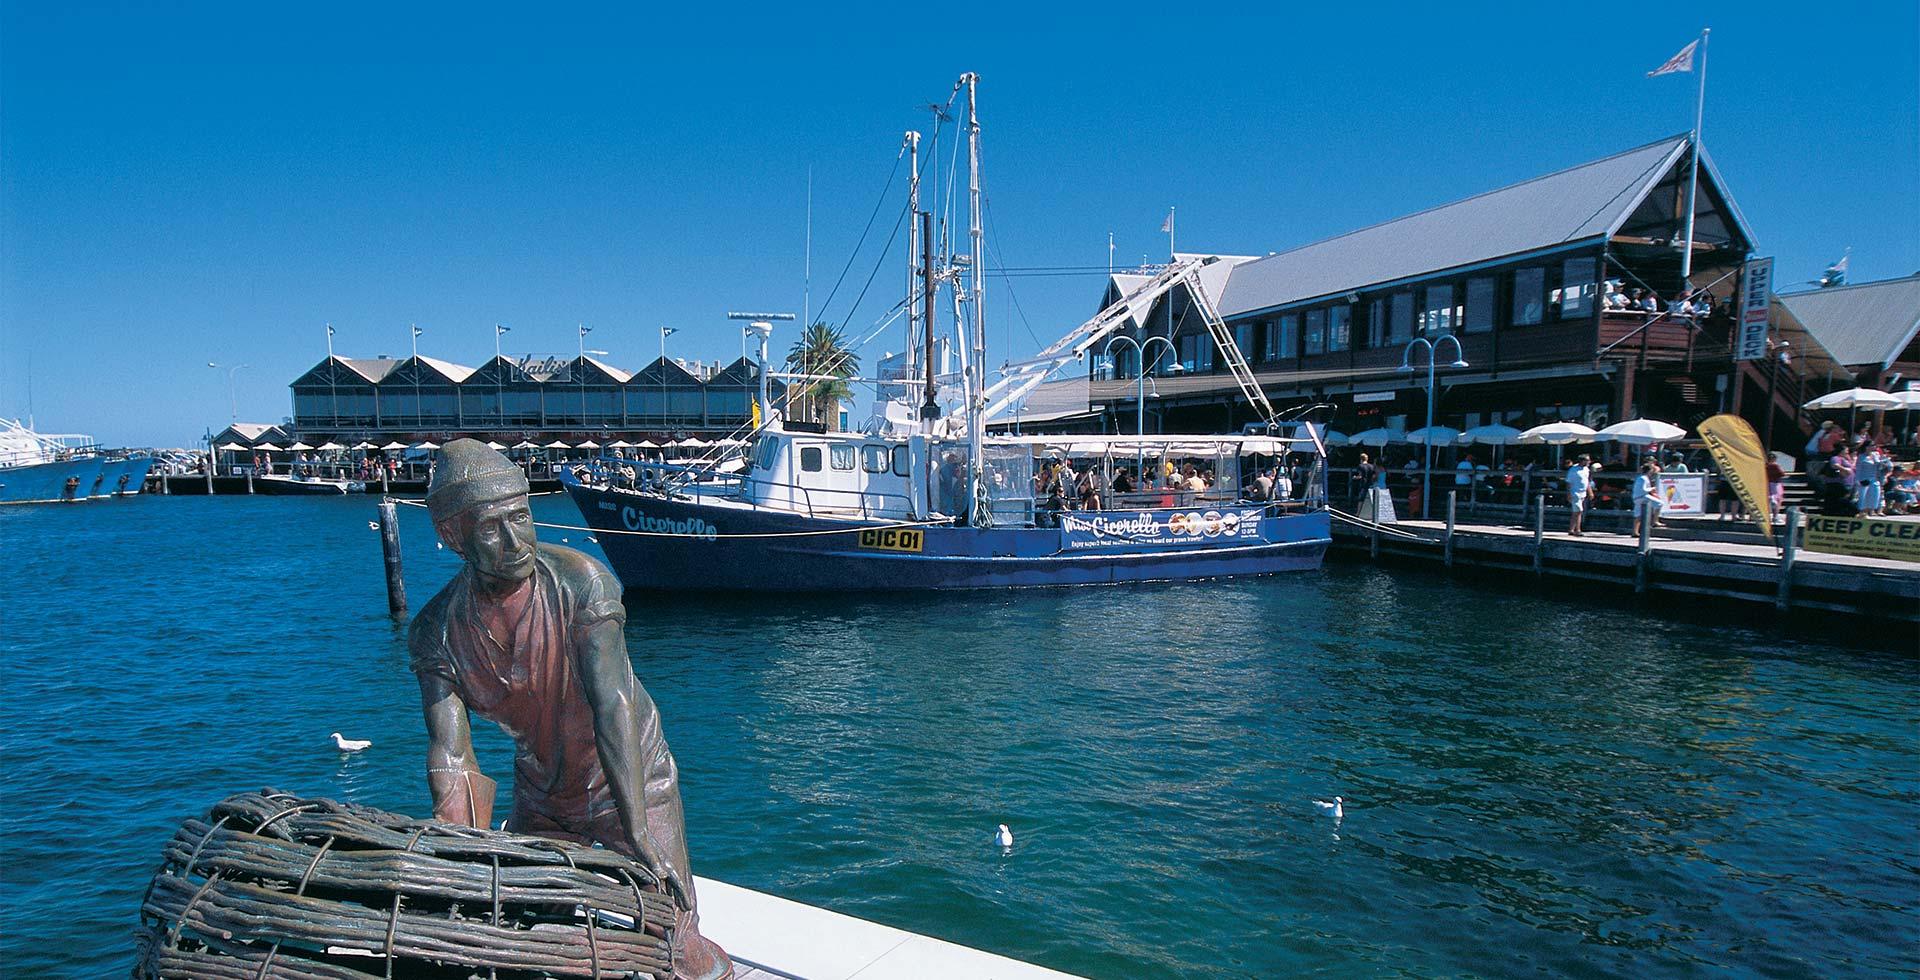 Witness lovely sculptures in Fremantle's Fishing boat harbour